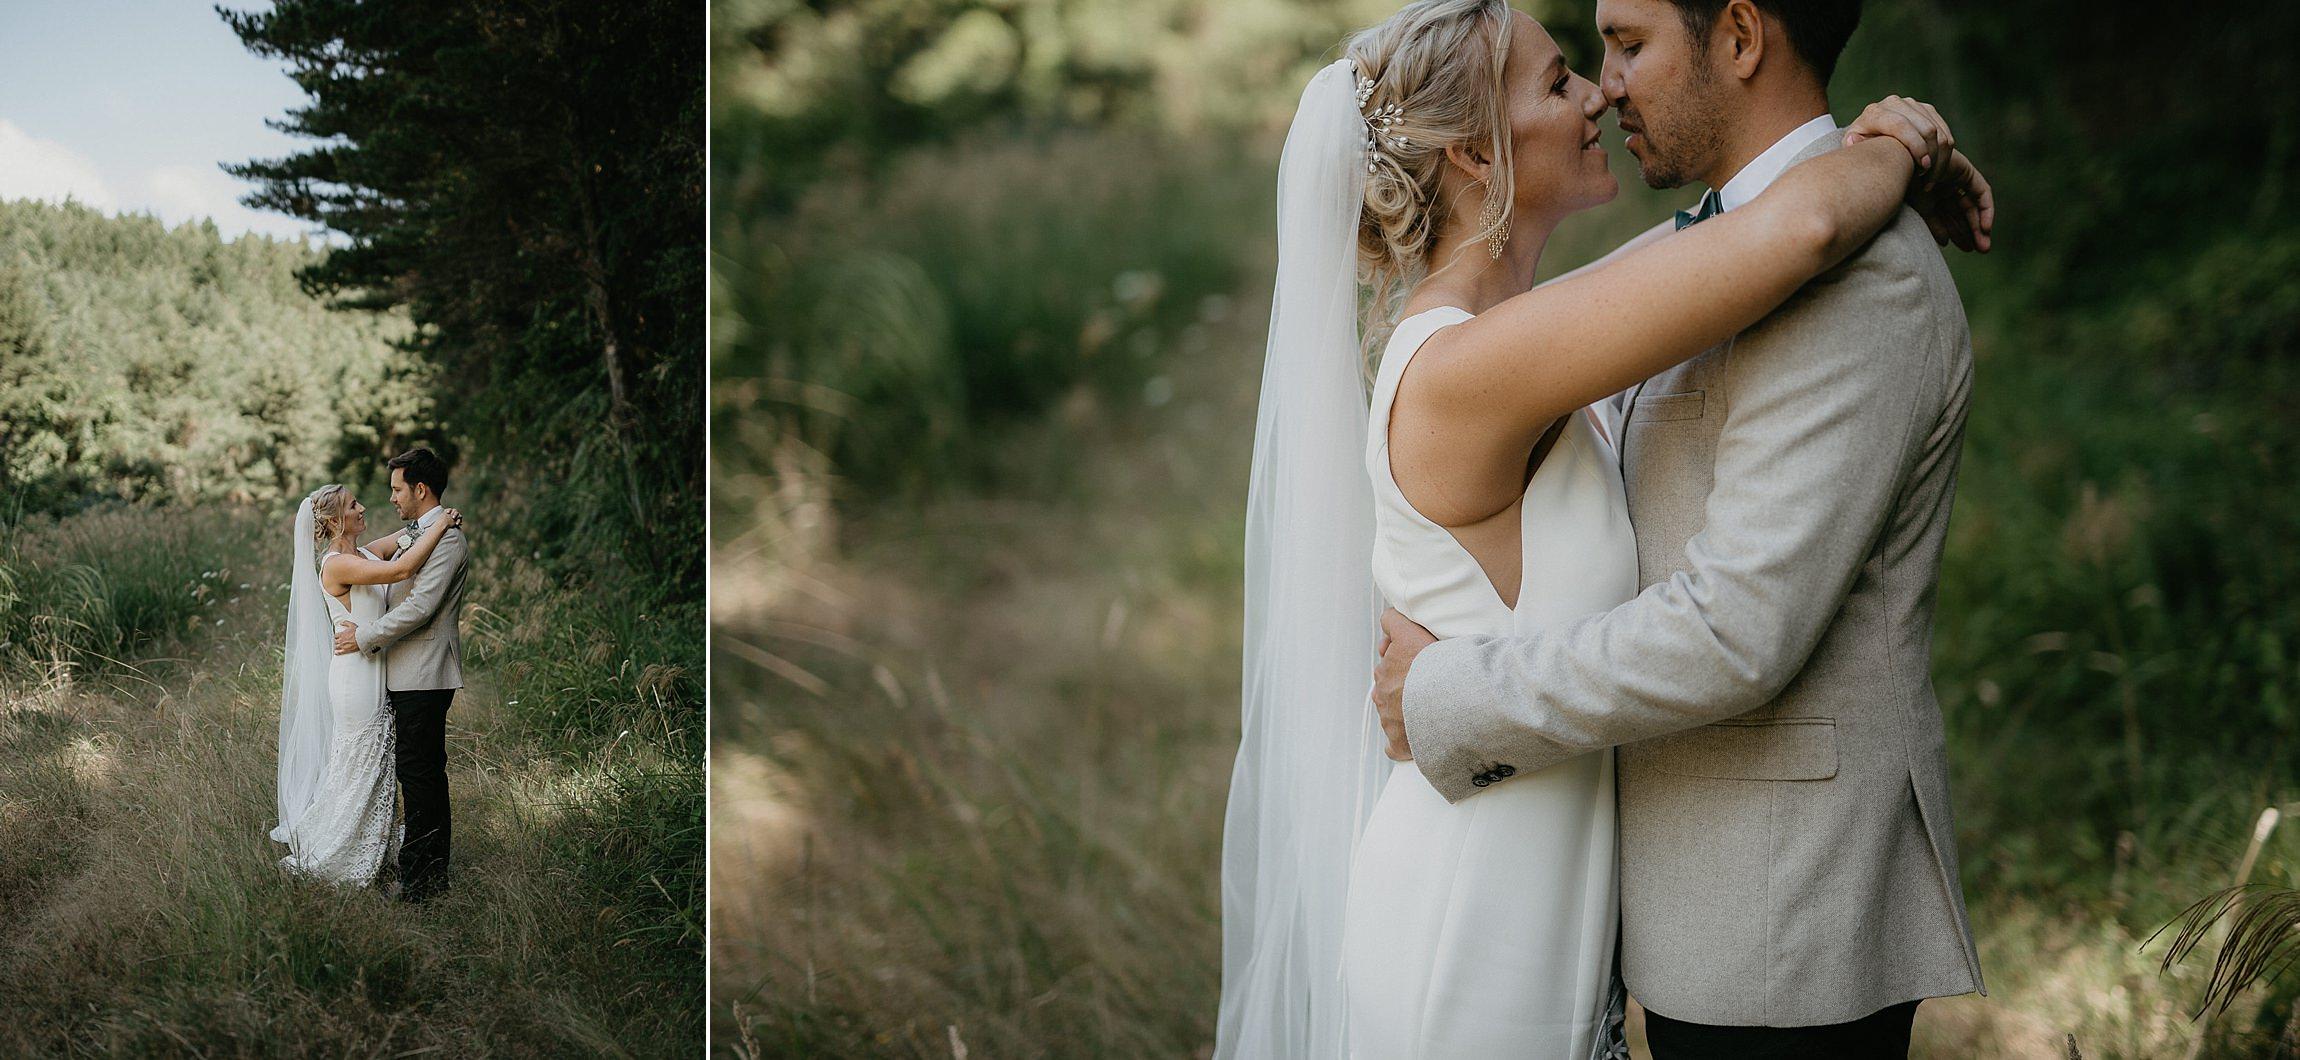 oldforestschool-wedding-blog-79.jpg